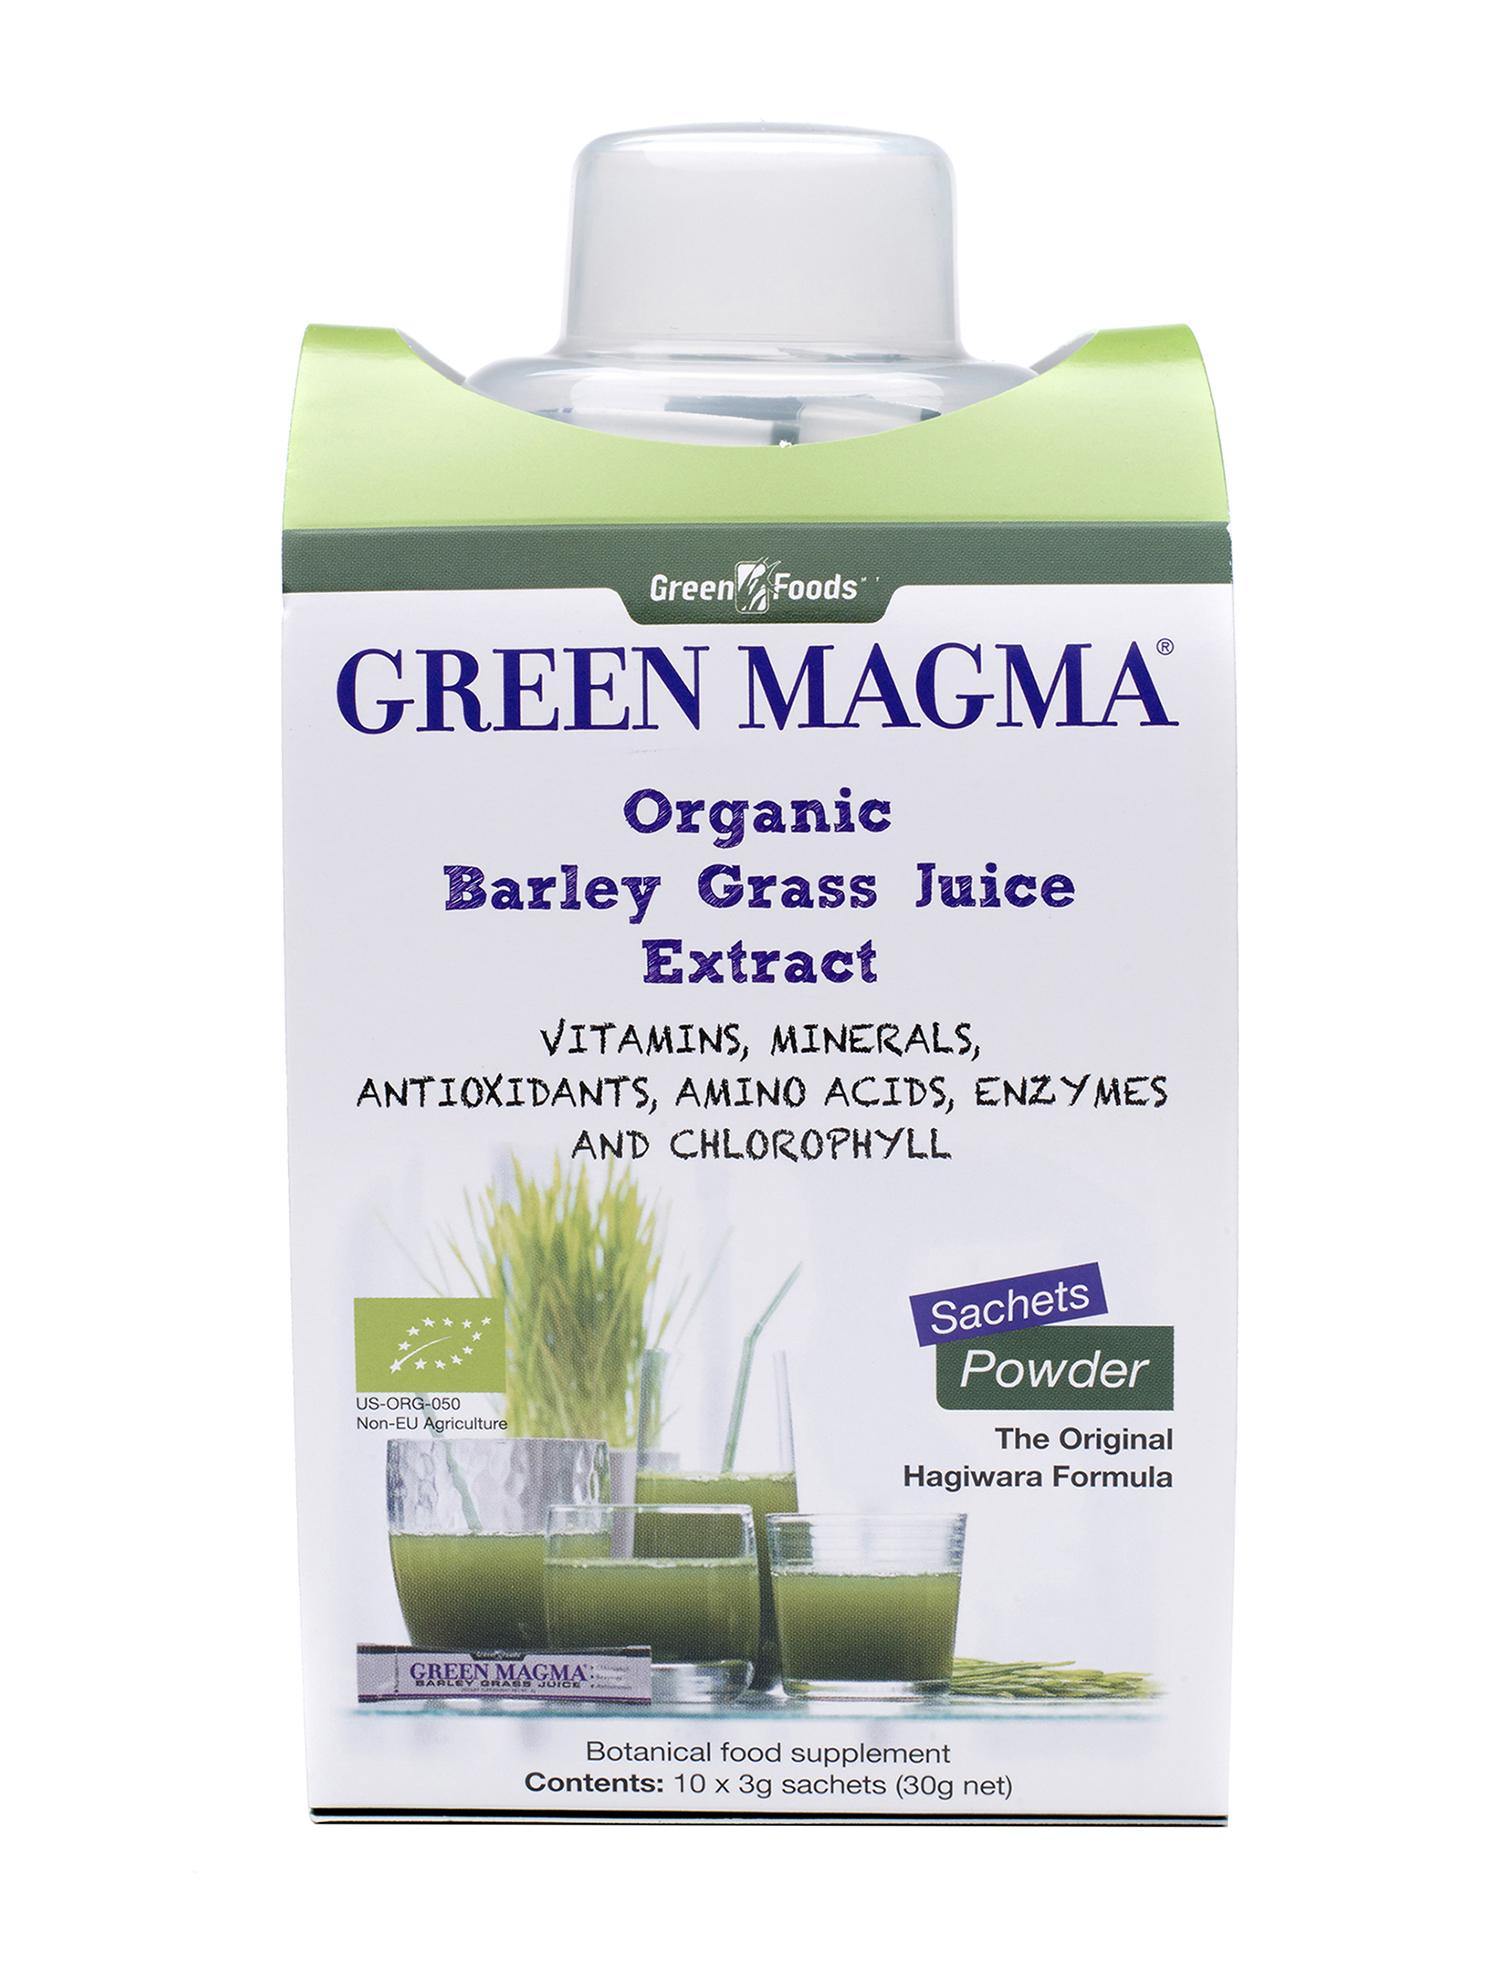 Organic Barley Grass Juice Extract 10 x 3g Sachets